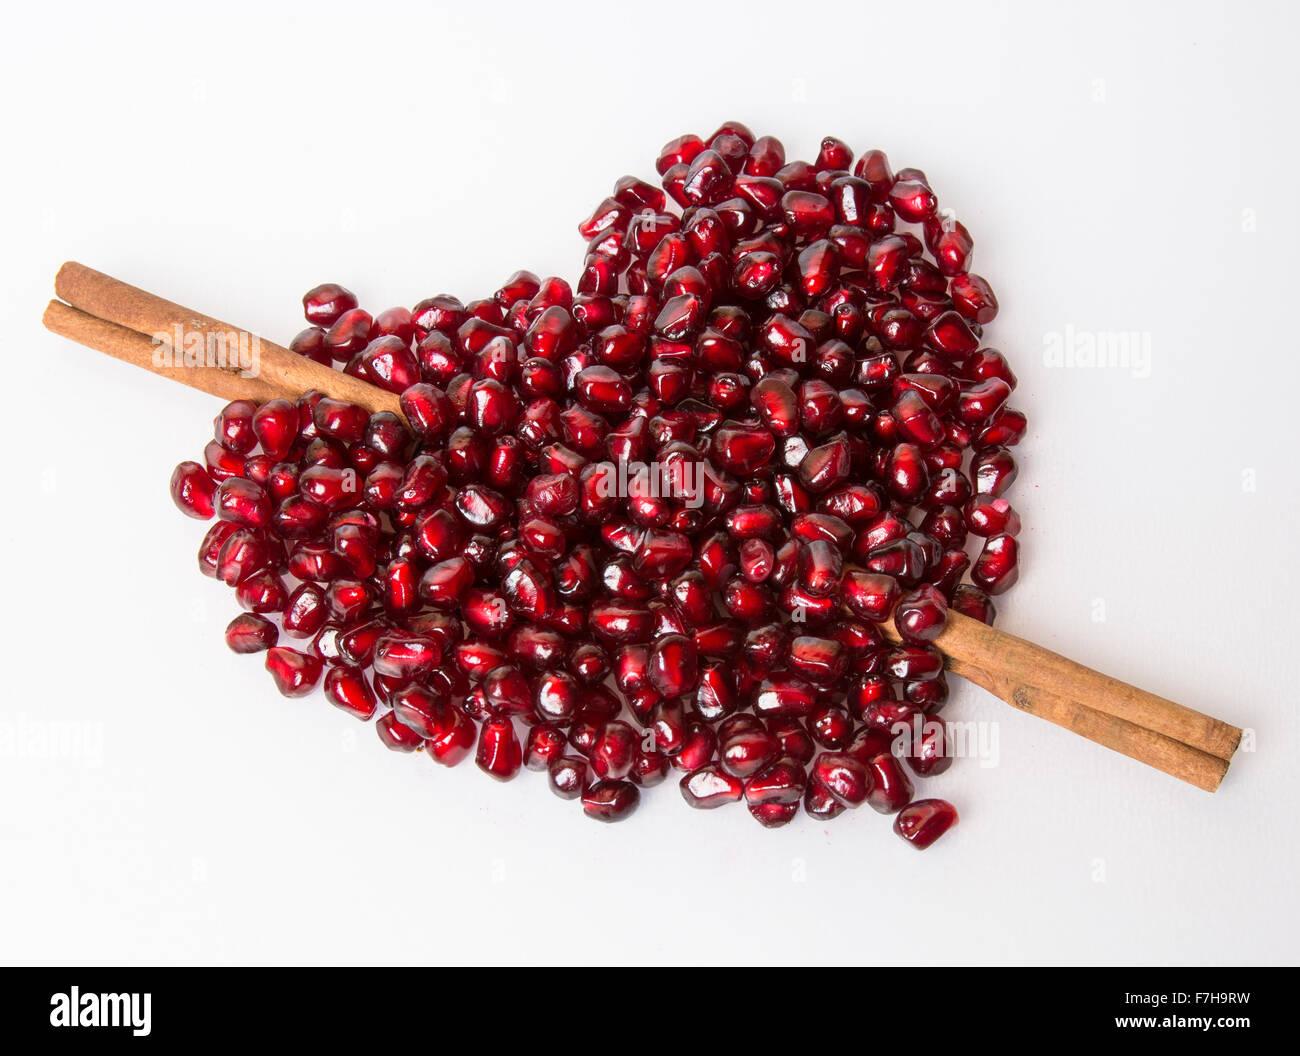 Symbol of love pomegranate fruit stock photo royalty free image symbol of love pomegranate fruit biocorpaavc